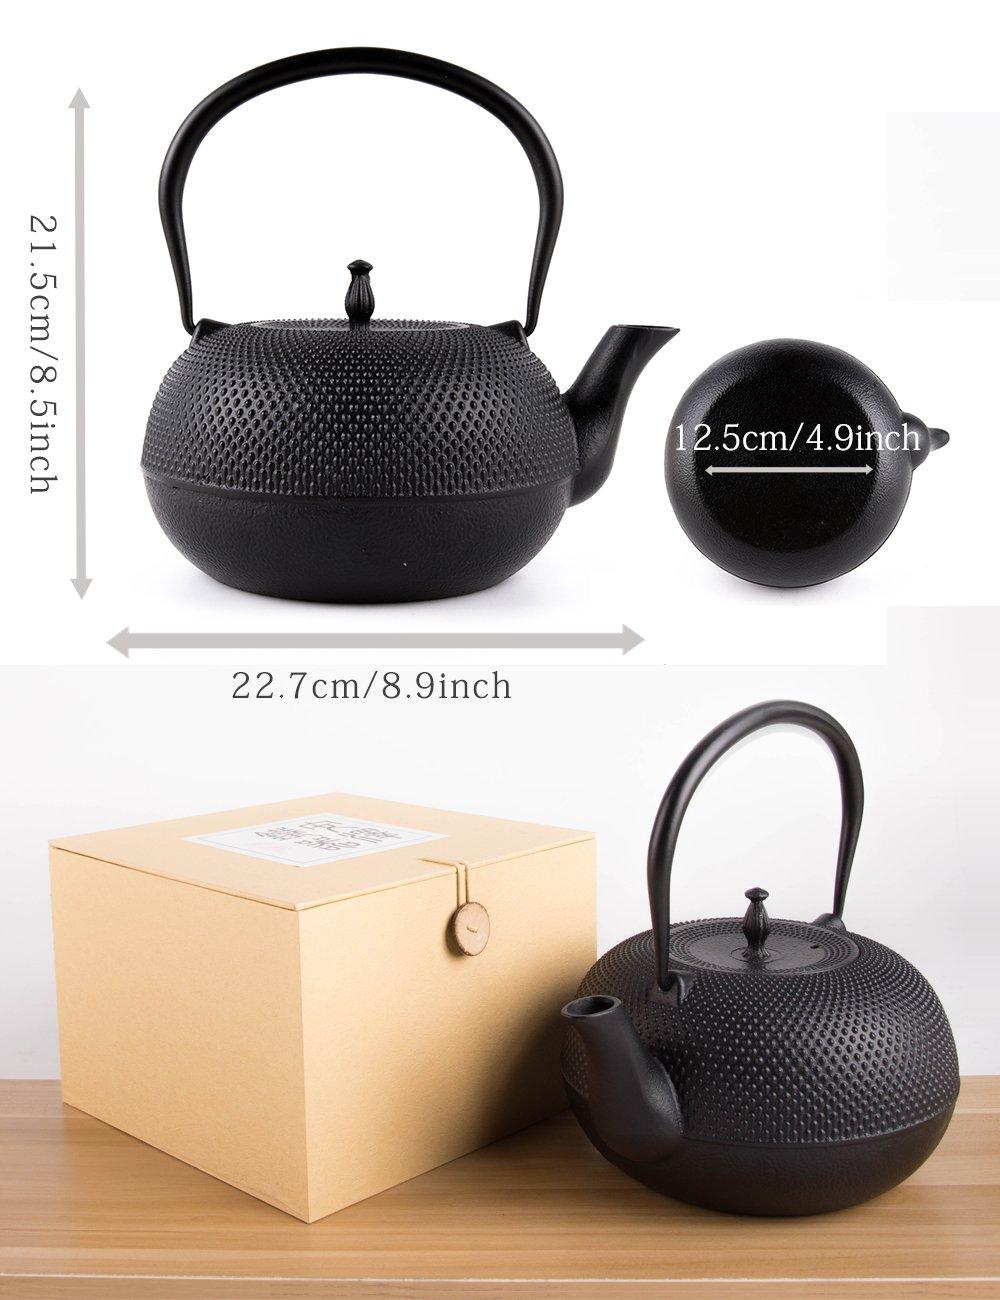 SUSTEAS Tetsubin Cast Iron Teapot with Stainless Steel Infuser Japanese tea pot kettle (65oz)